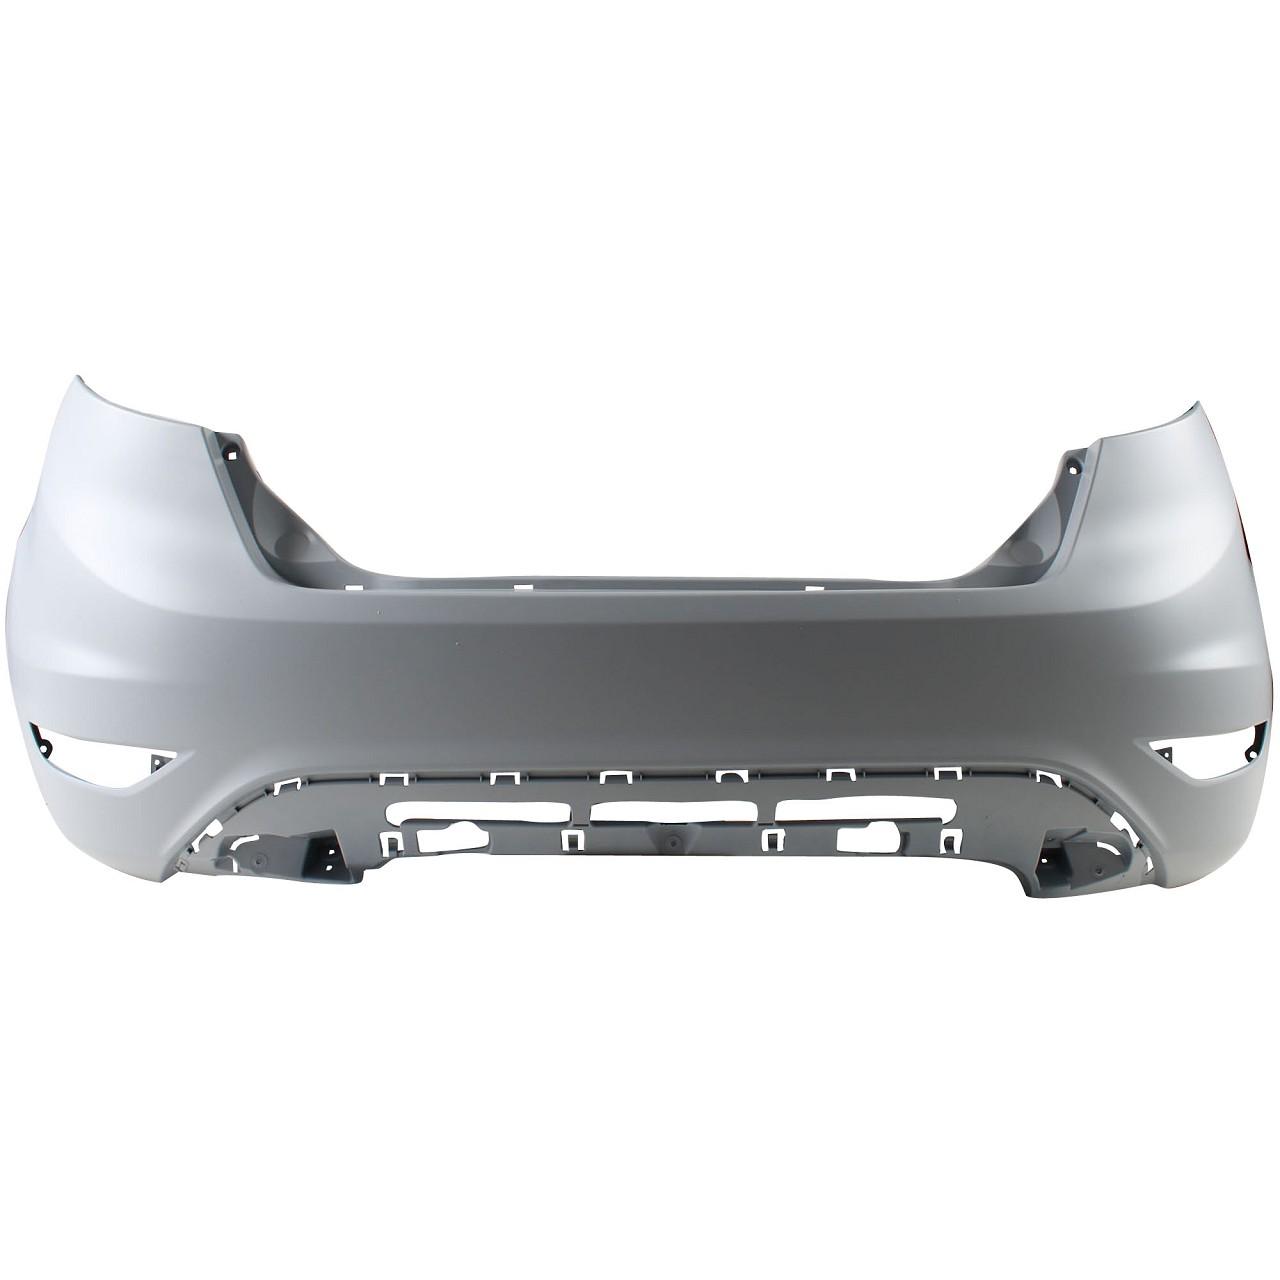 ORIGINAL Ford Stoßstange Stoßfänger Heckstoßstange Fiesta VI hinten 1730685